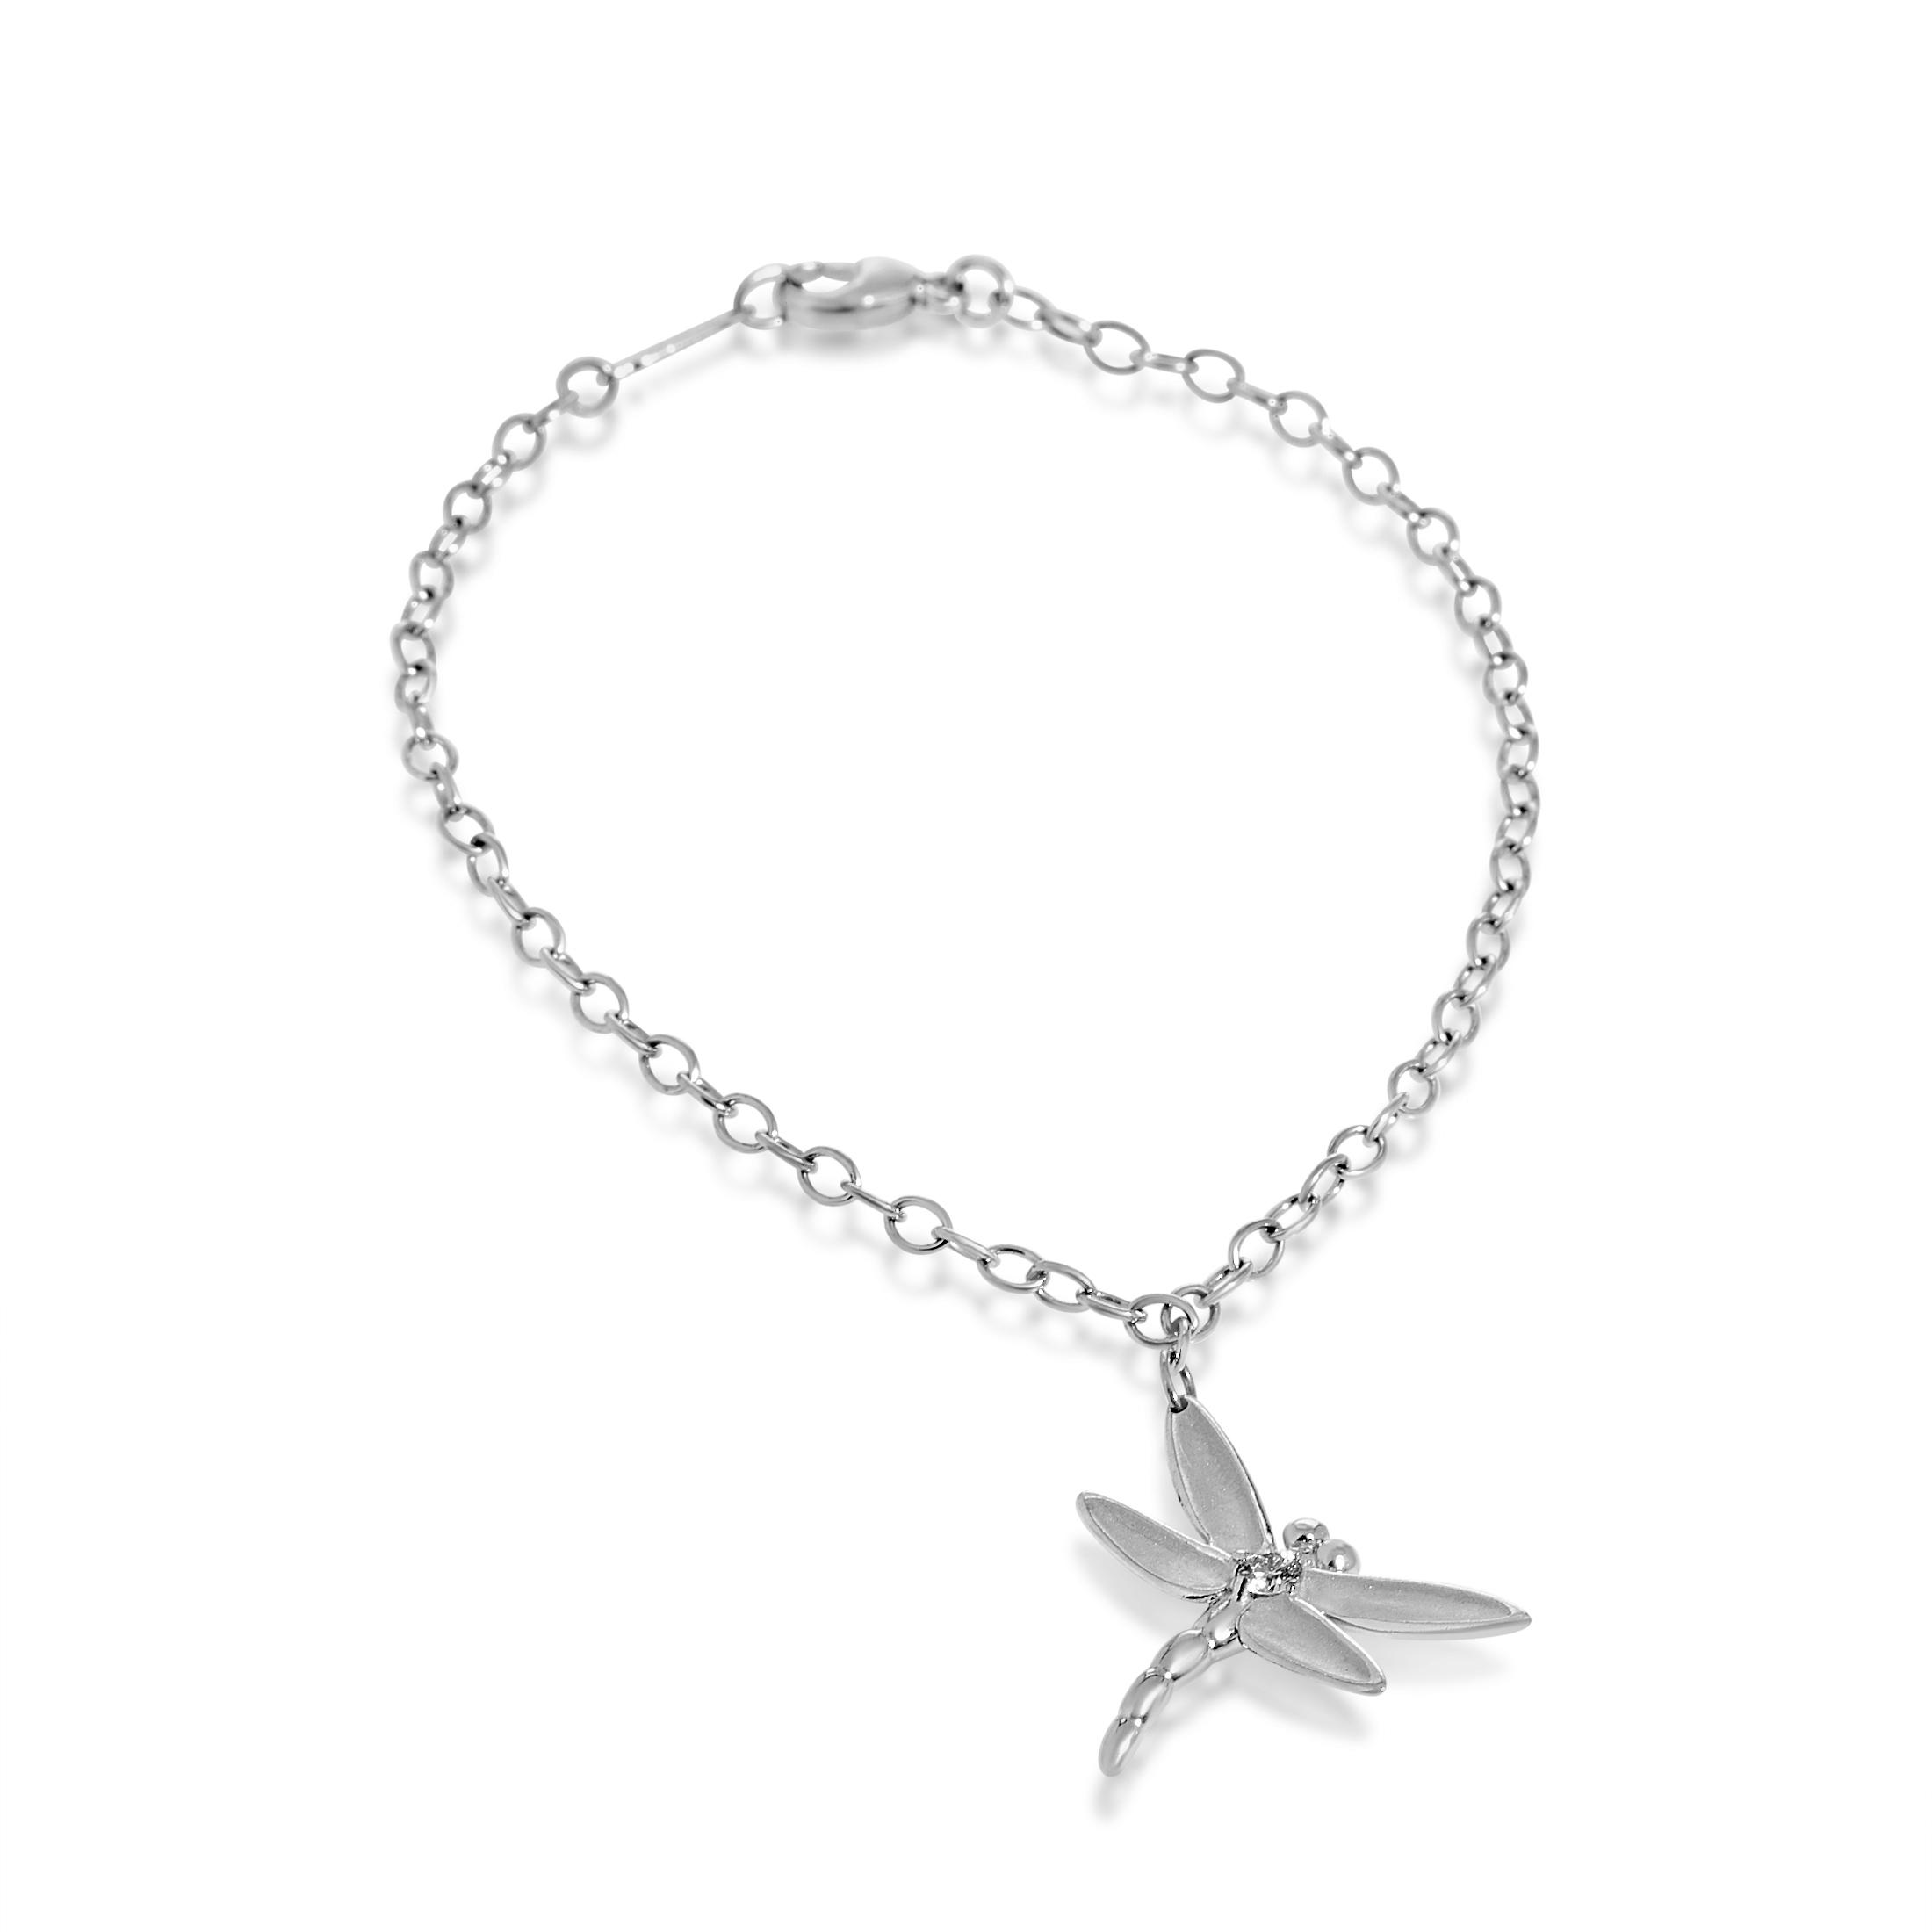 Tiffany & Co. Enchant Women's 18K White Gold Diamond Dragonfly Charm Bracelet